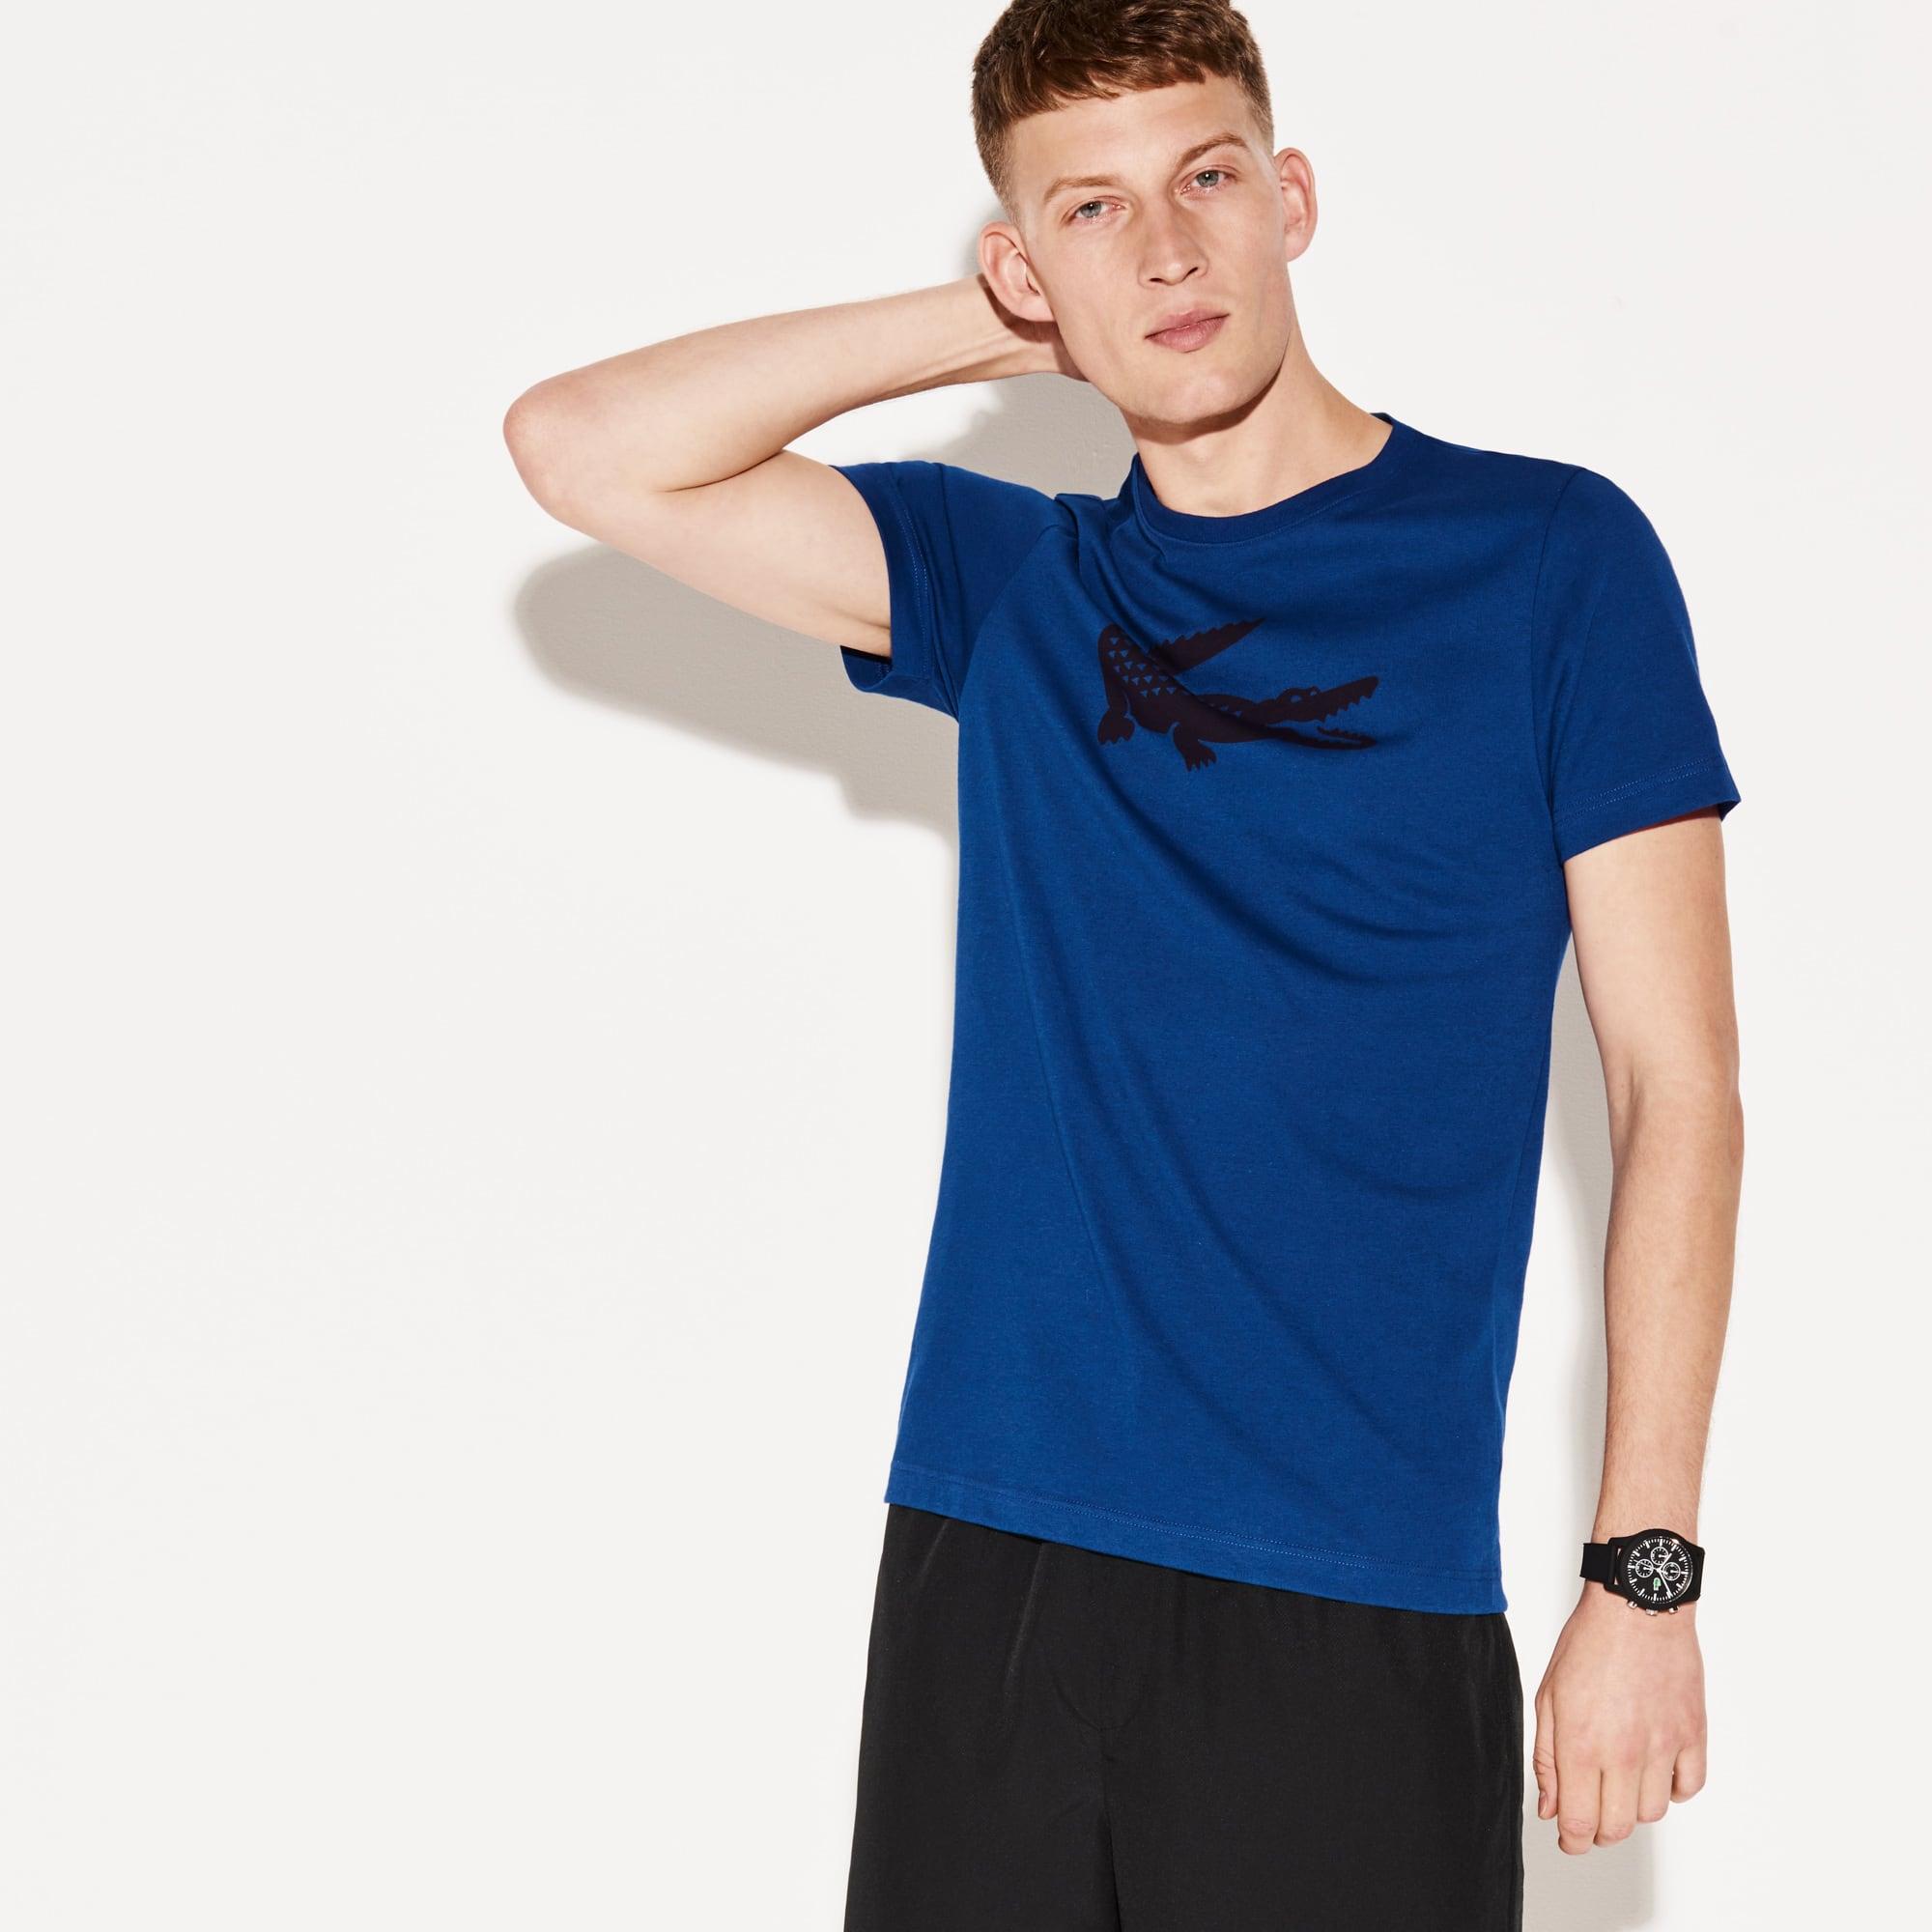 Herren LACOSTE Sport T-Shirt, Funktionsjersey